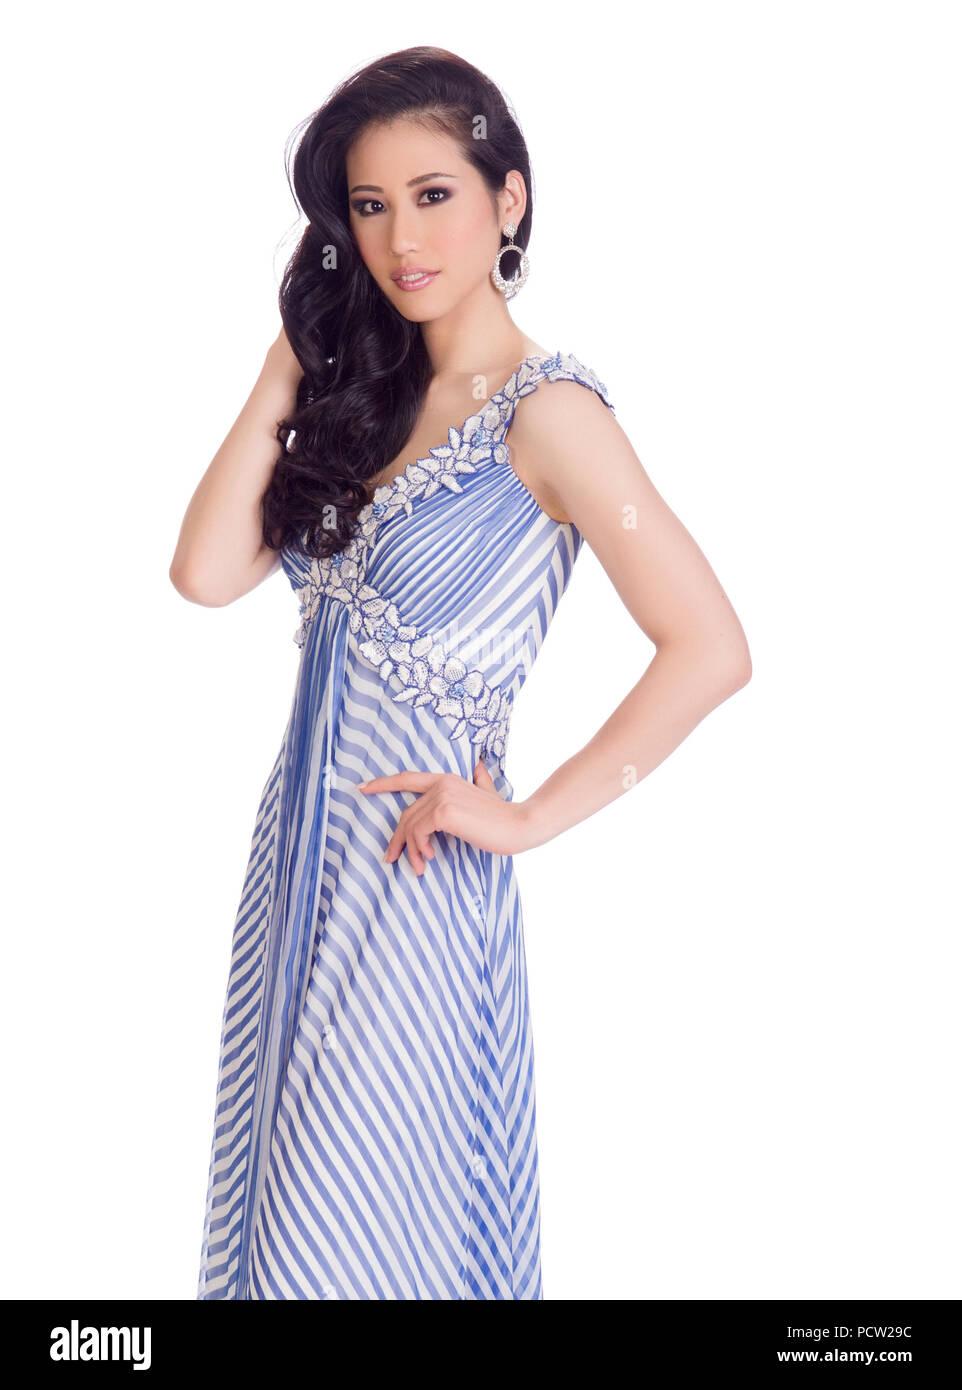 Doral Fl January 23 Keiko Tsuji Miss Japan 2014 Poses Is Her